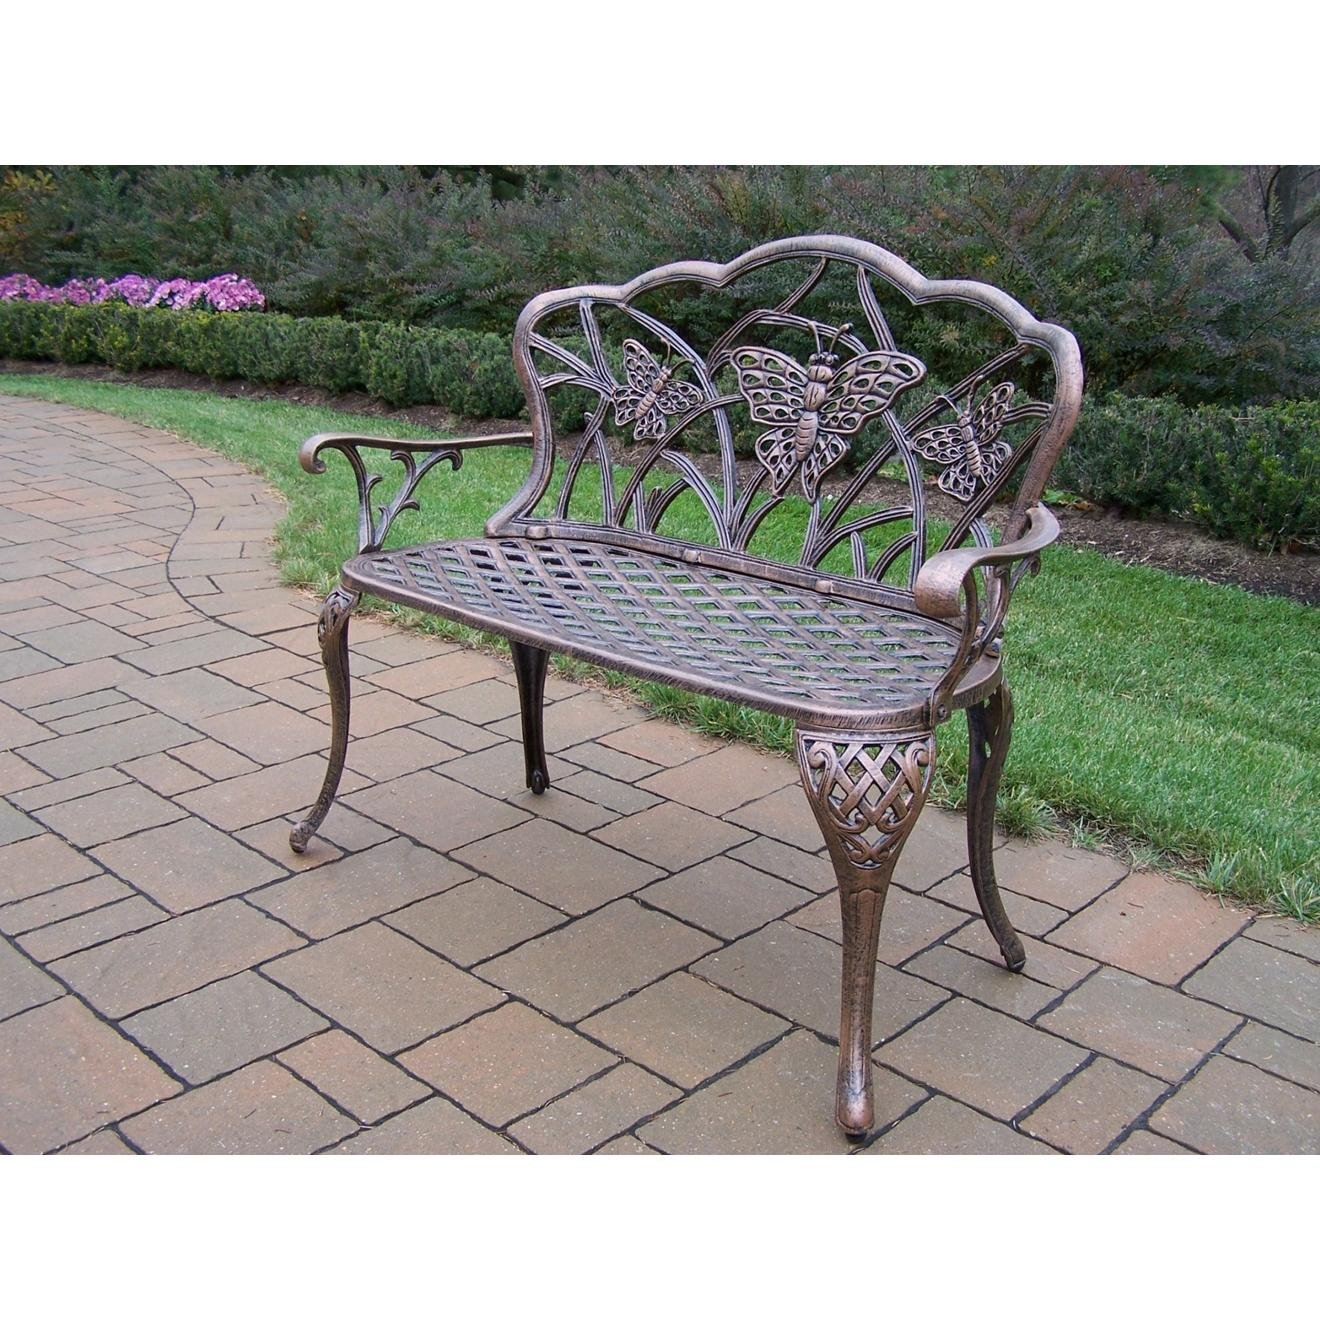 Amazon.com : Oakland Living Butterfly Cast Aluminum Loveseat, Antique  Bronze : Outdoor And Patio Furniture Sets : Garden U0026 Outdoor